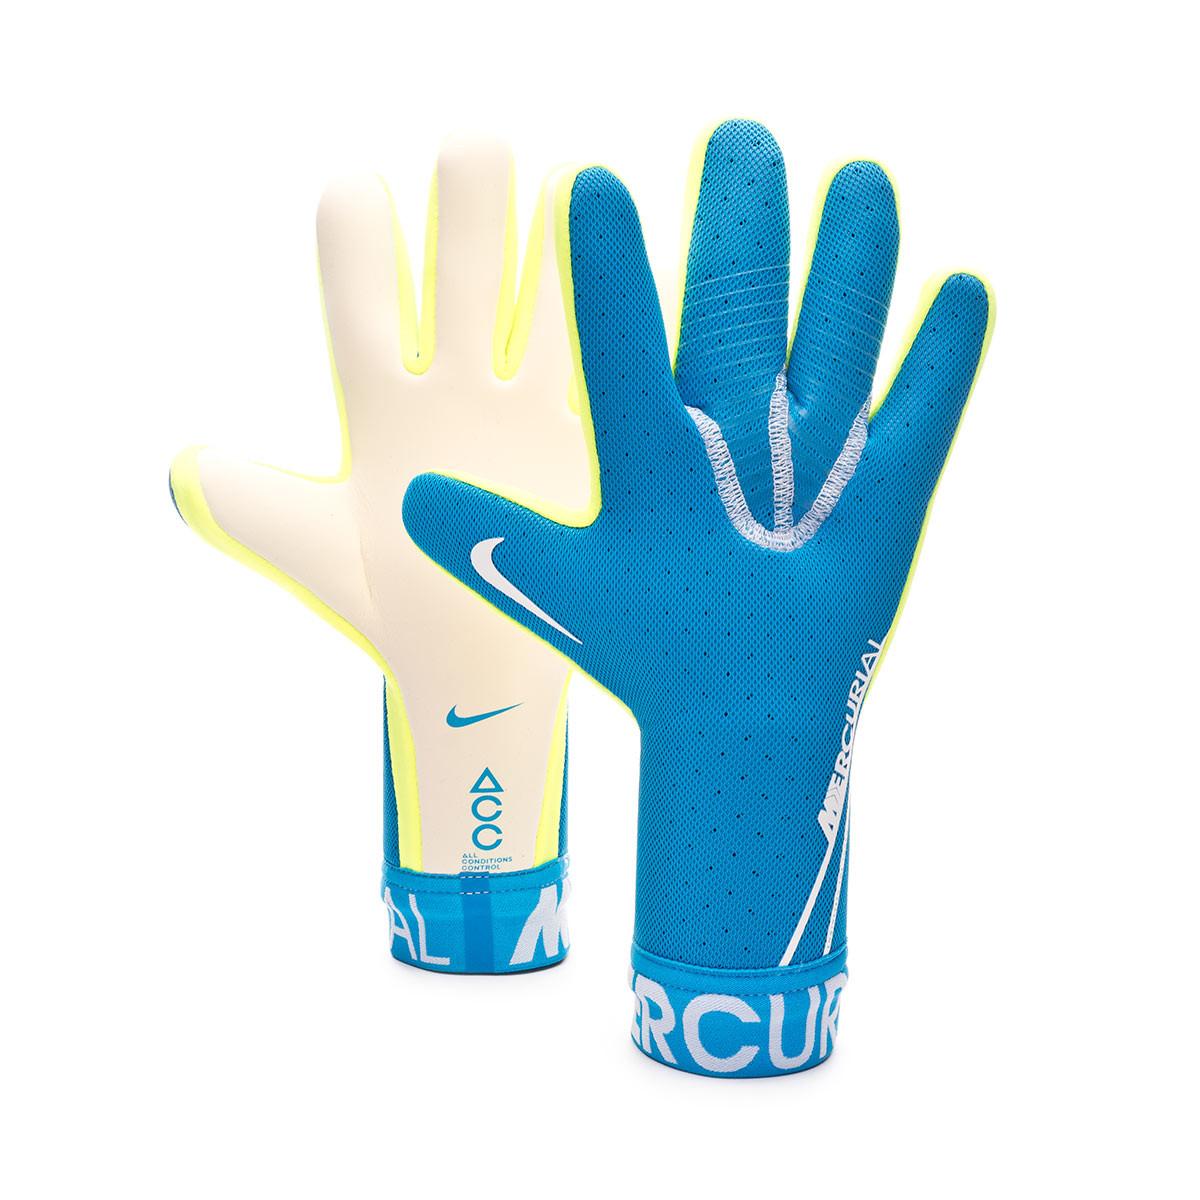 adolescente Entrada Carteles  Glove Nike Mercurial Touch Elite Blue hero-White - Football store Fútbol  Emotion